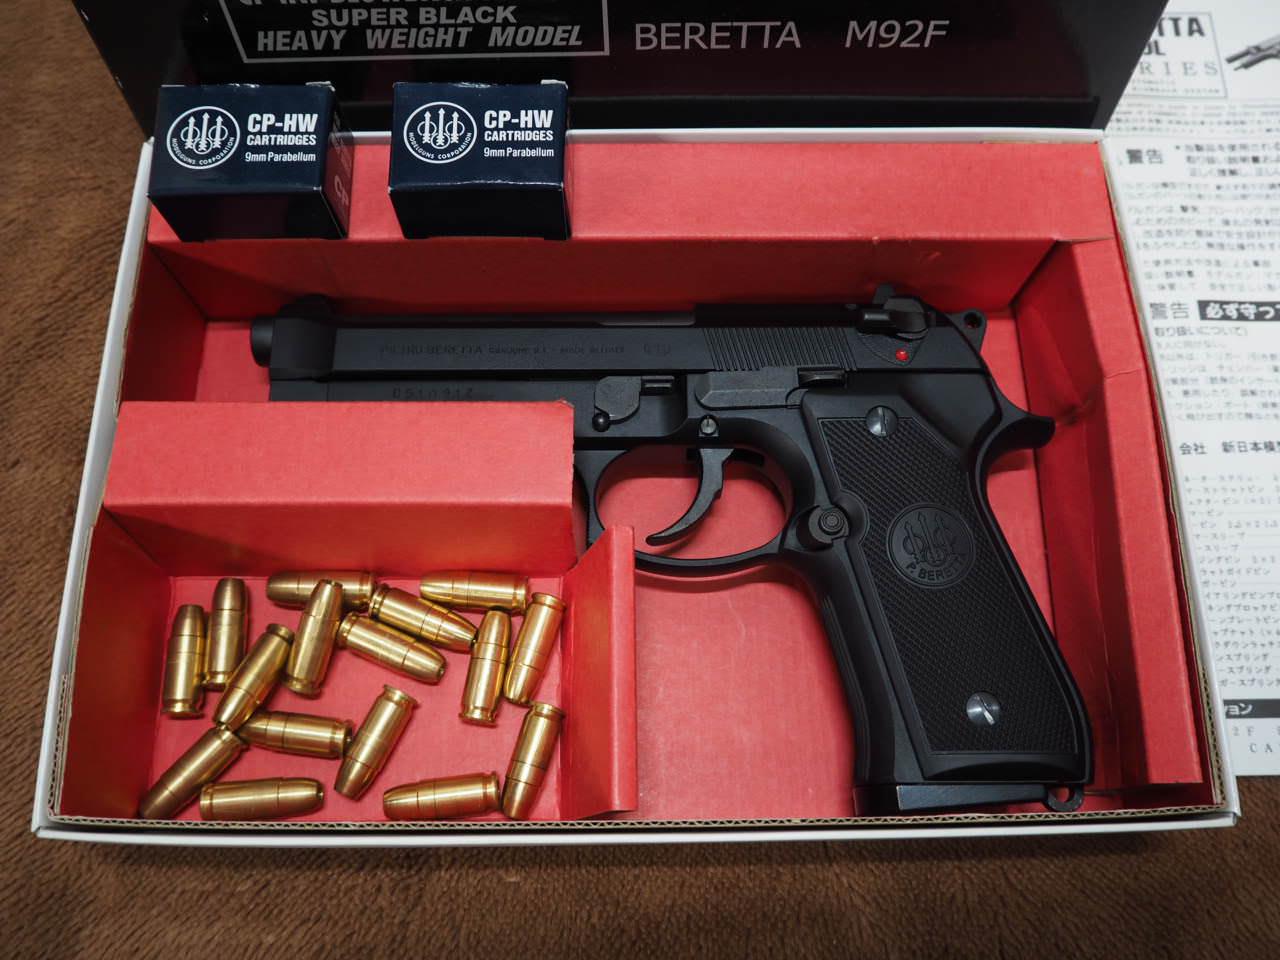 MGC ベレッタ M9 スーパーブラック HW 買取